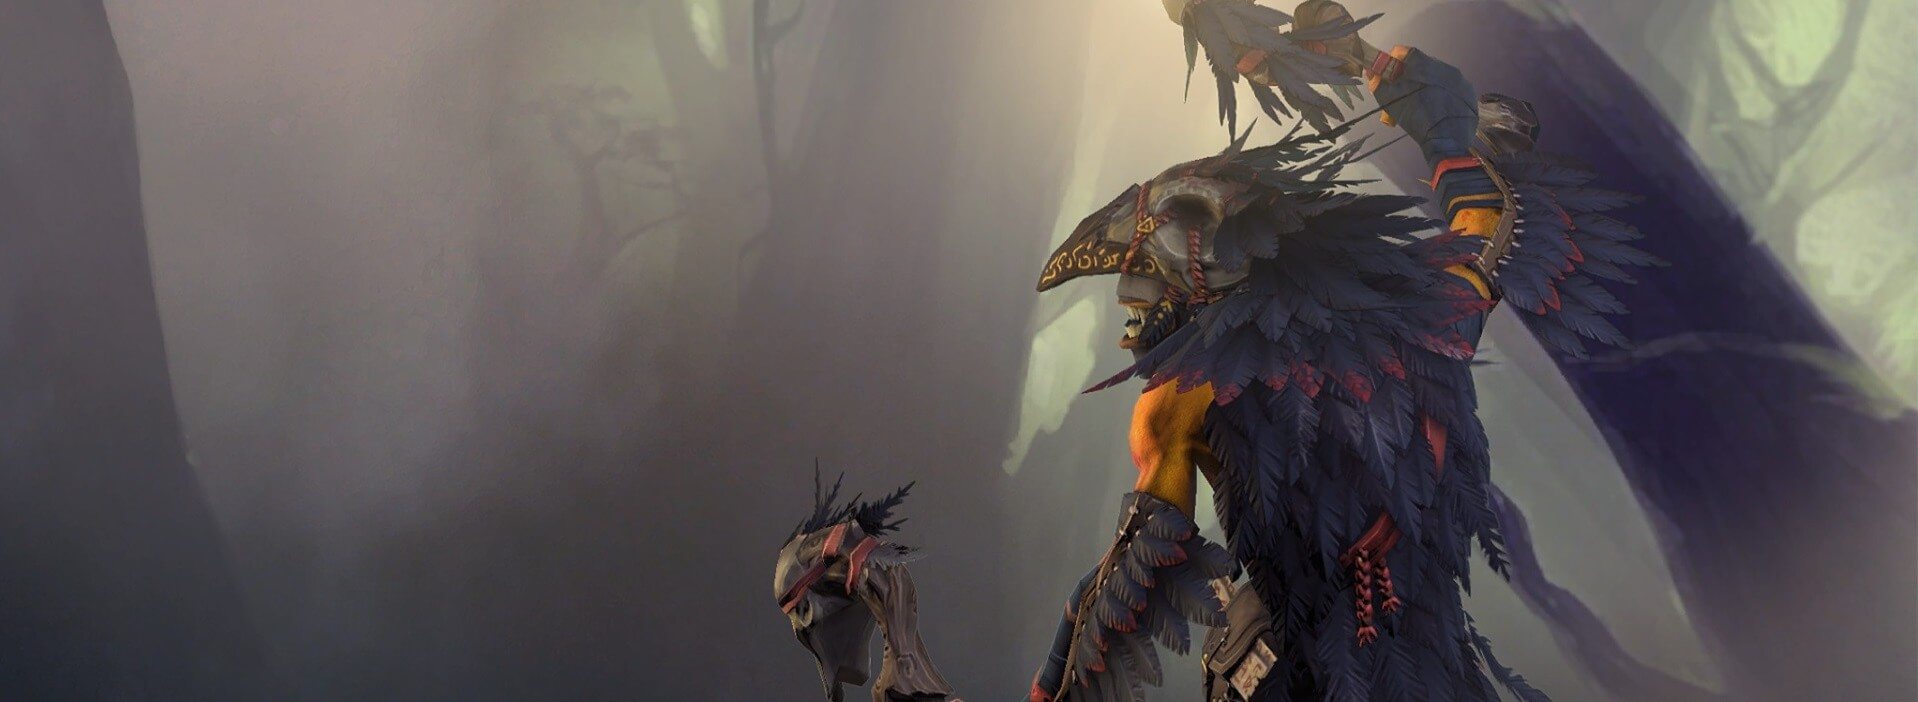 True Crow loading screen for Shadow Shaman - Image: Valve